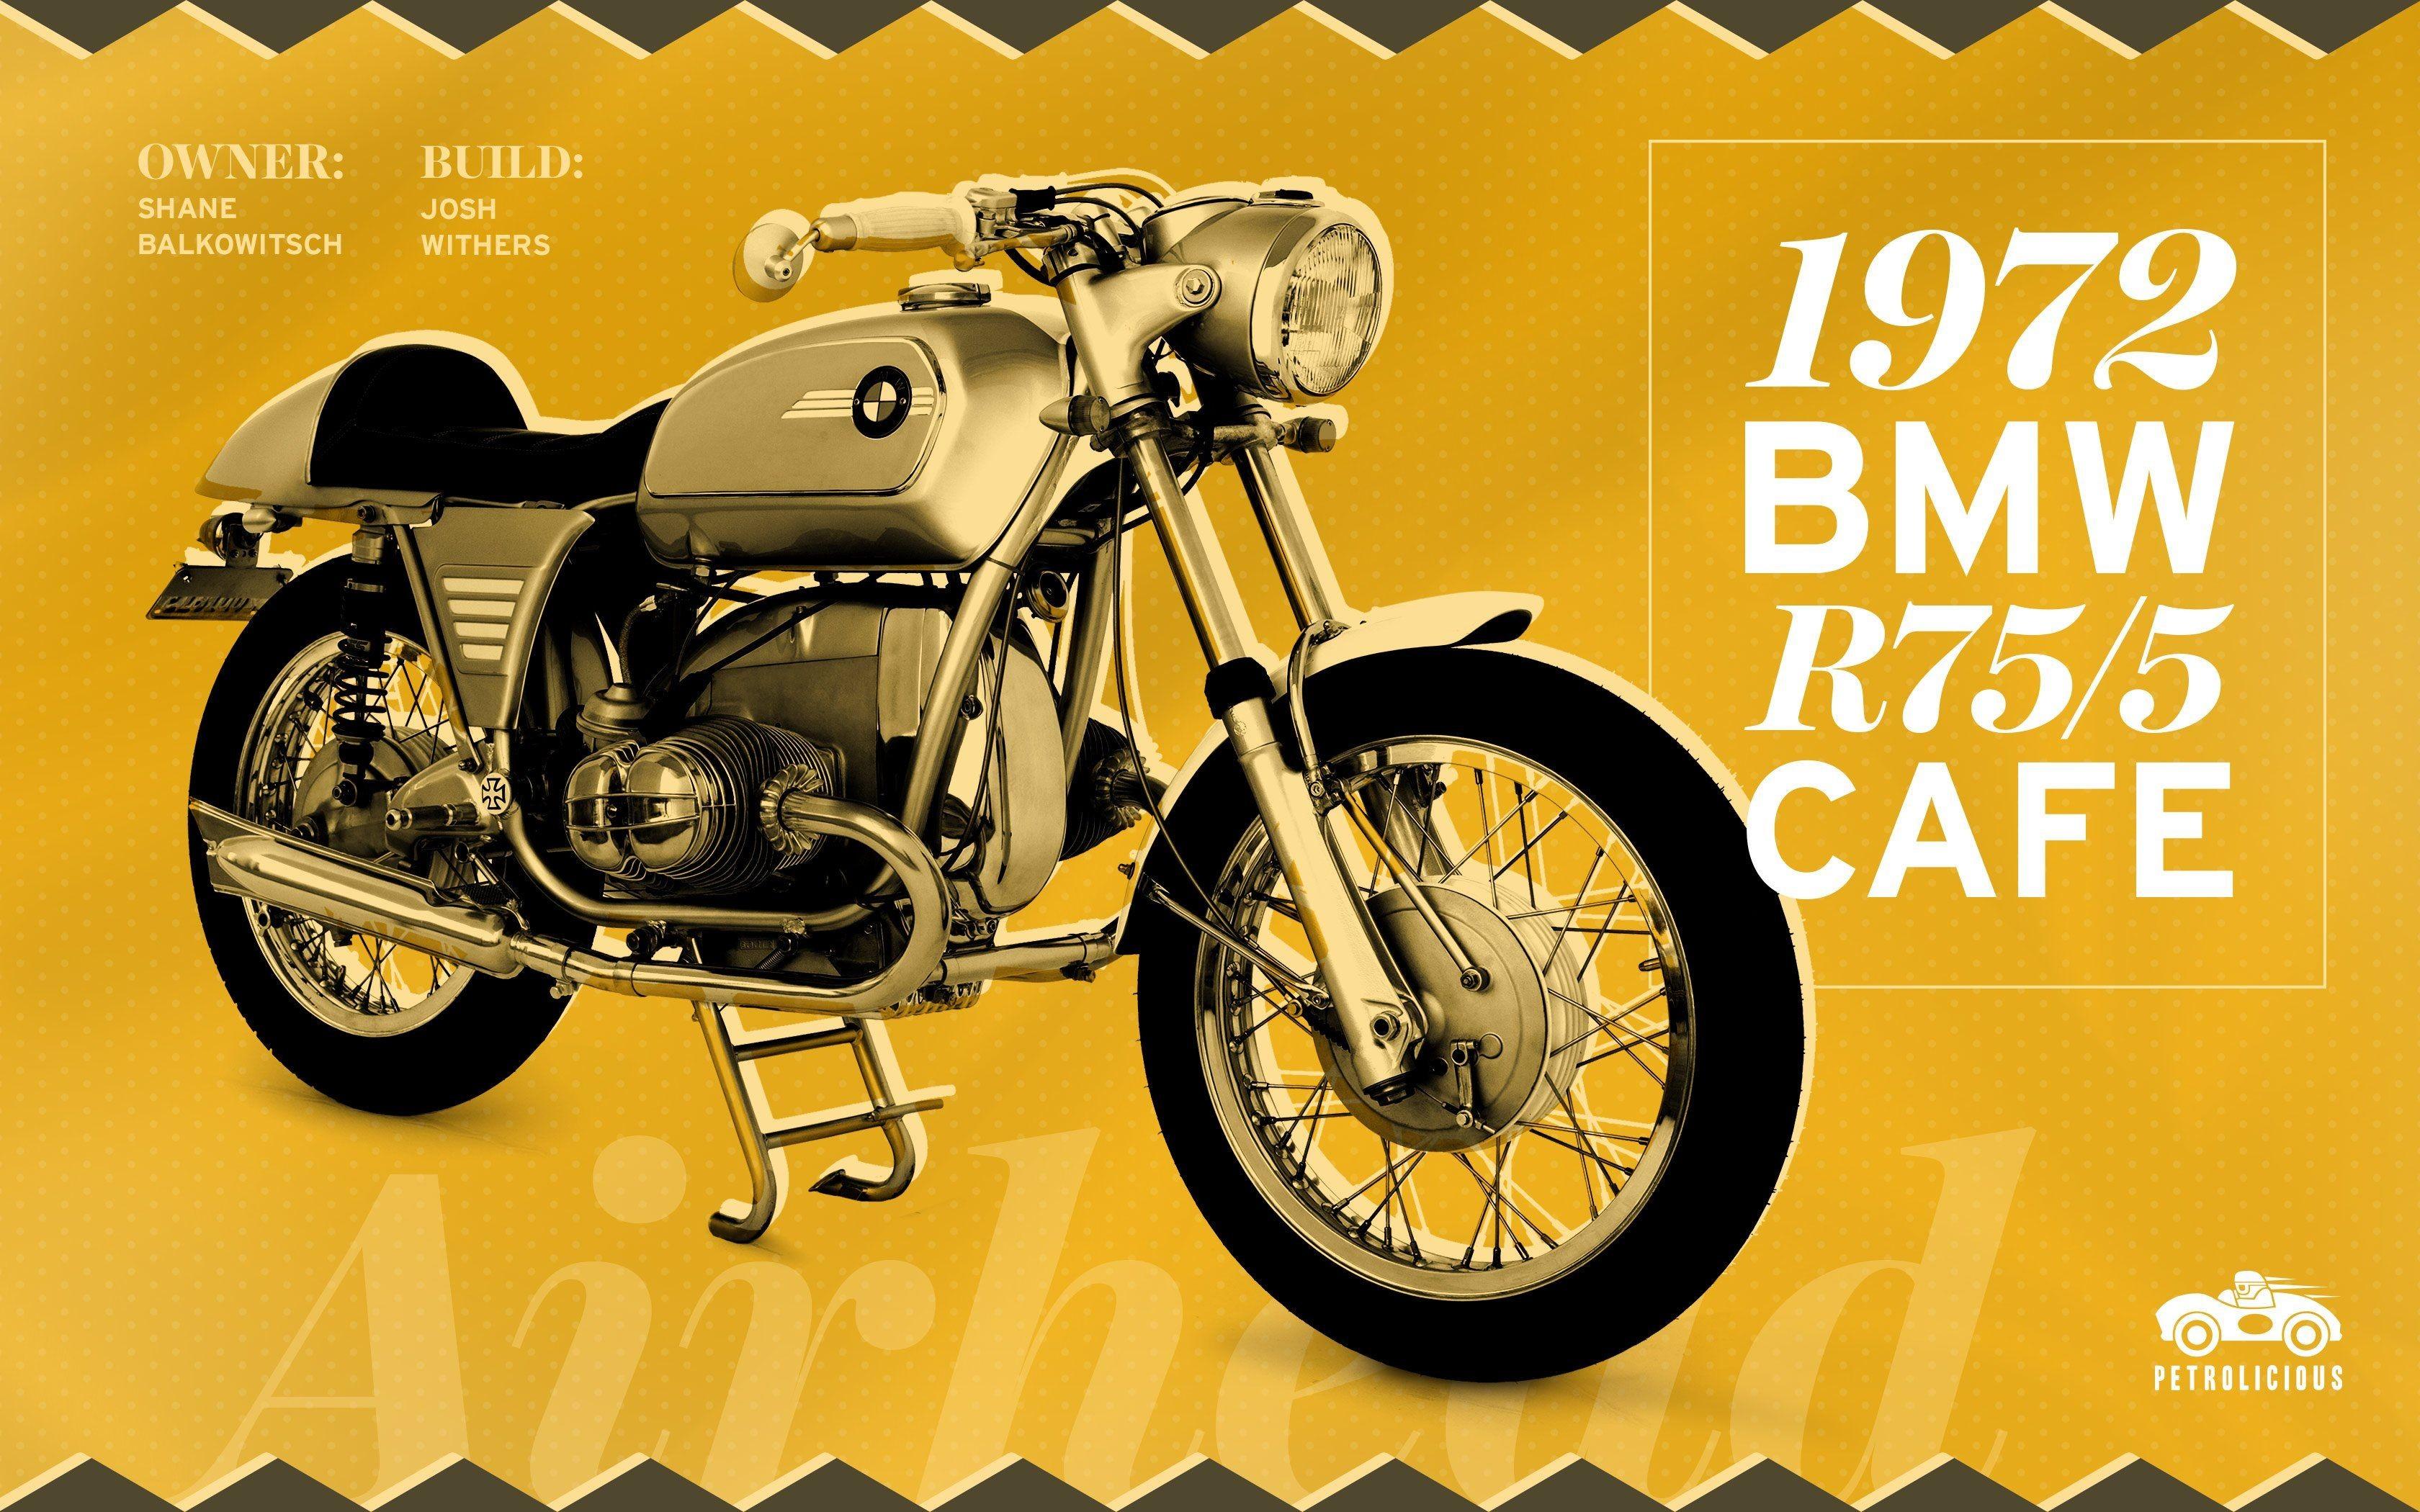 Res: 3360x2100, Vintage Motorcycle Wallpaper 1080p